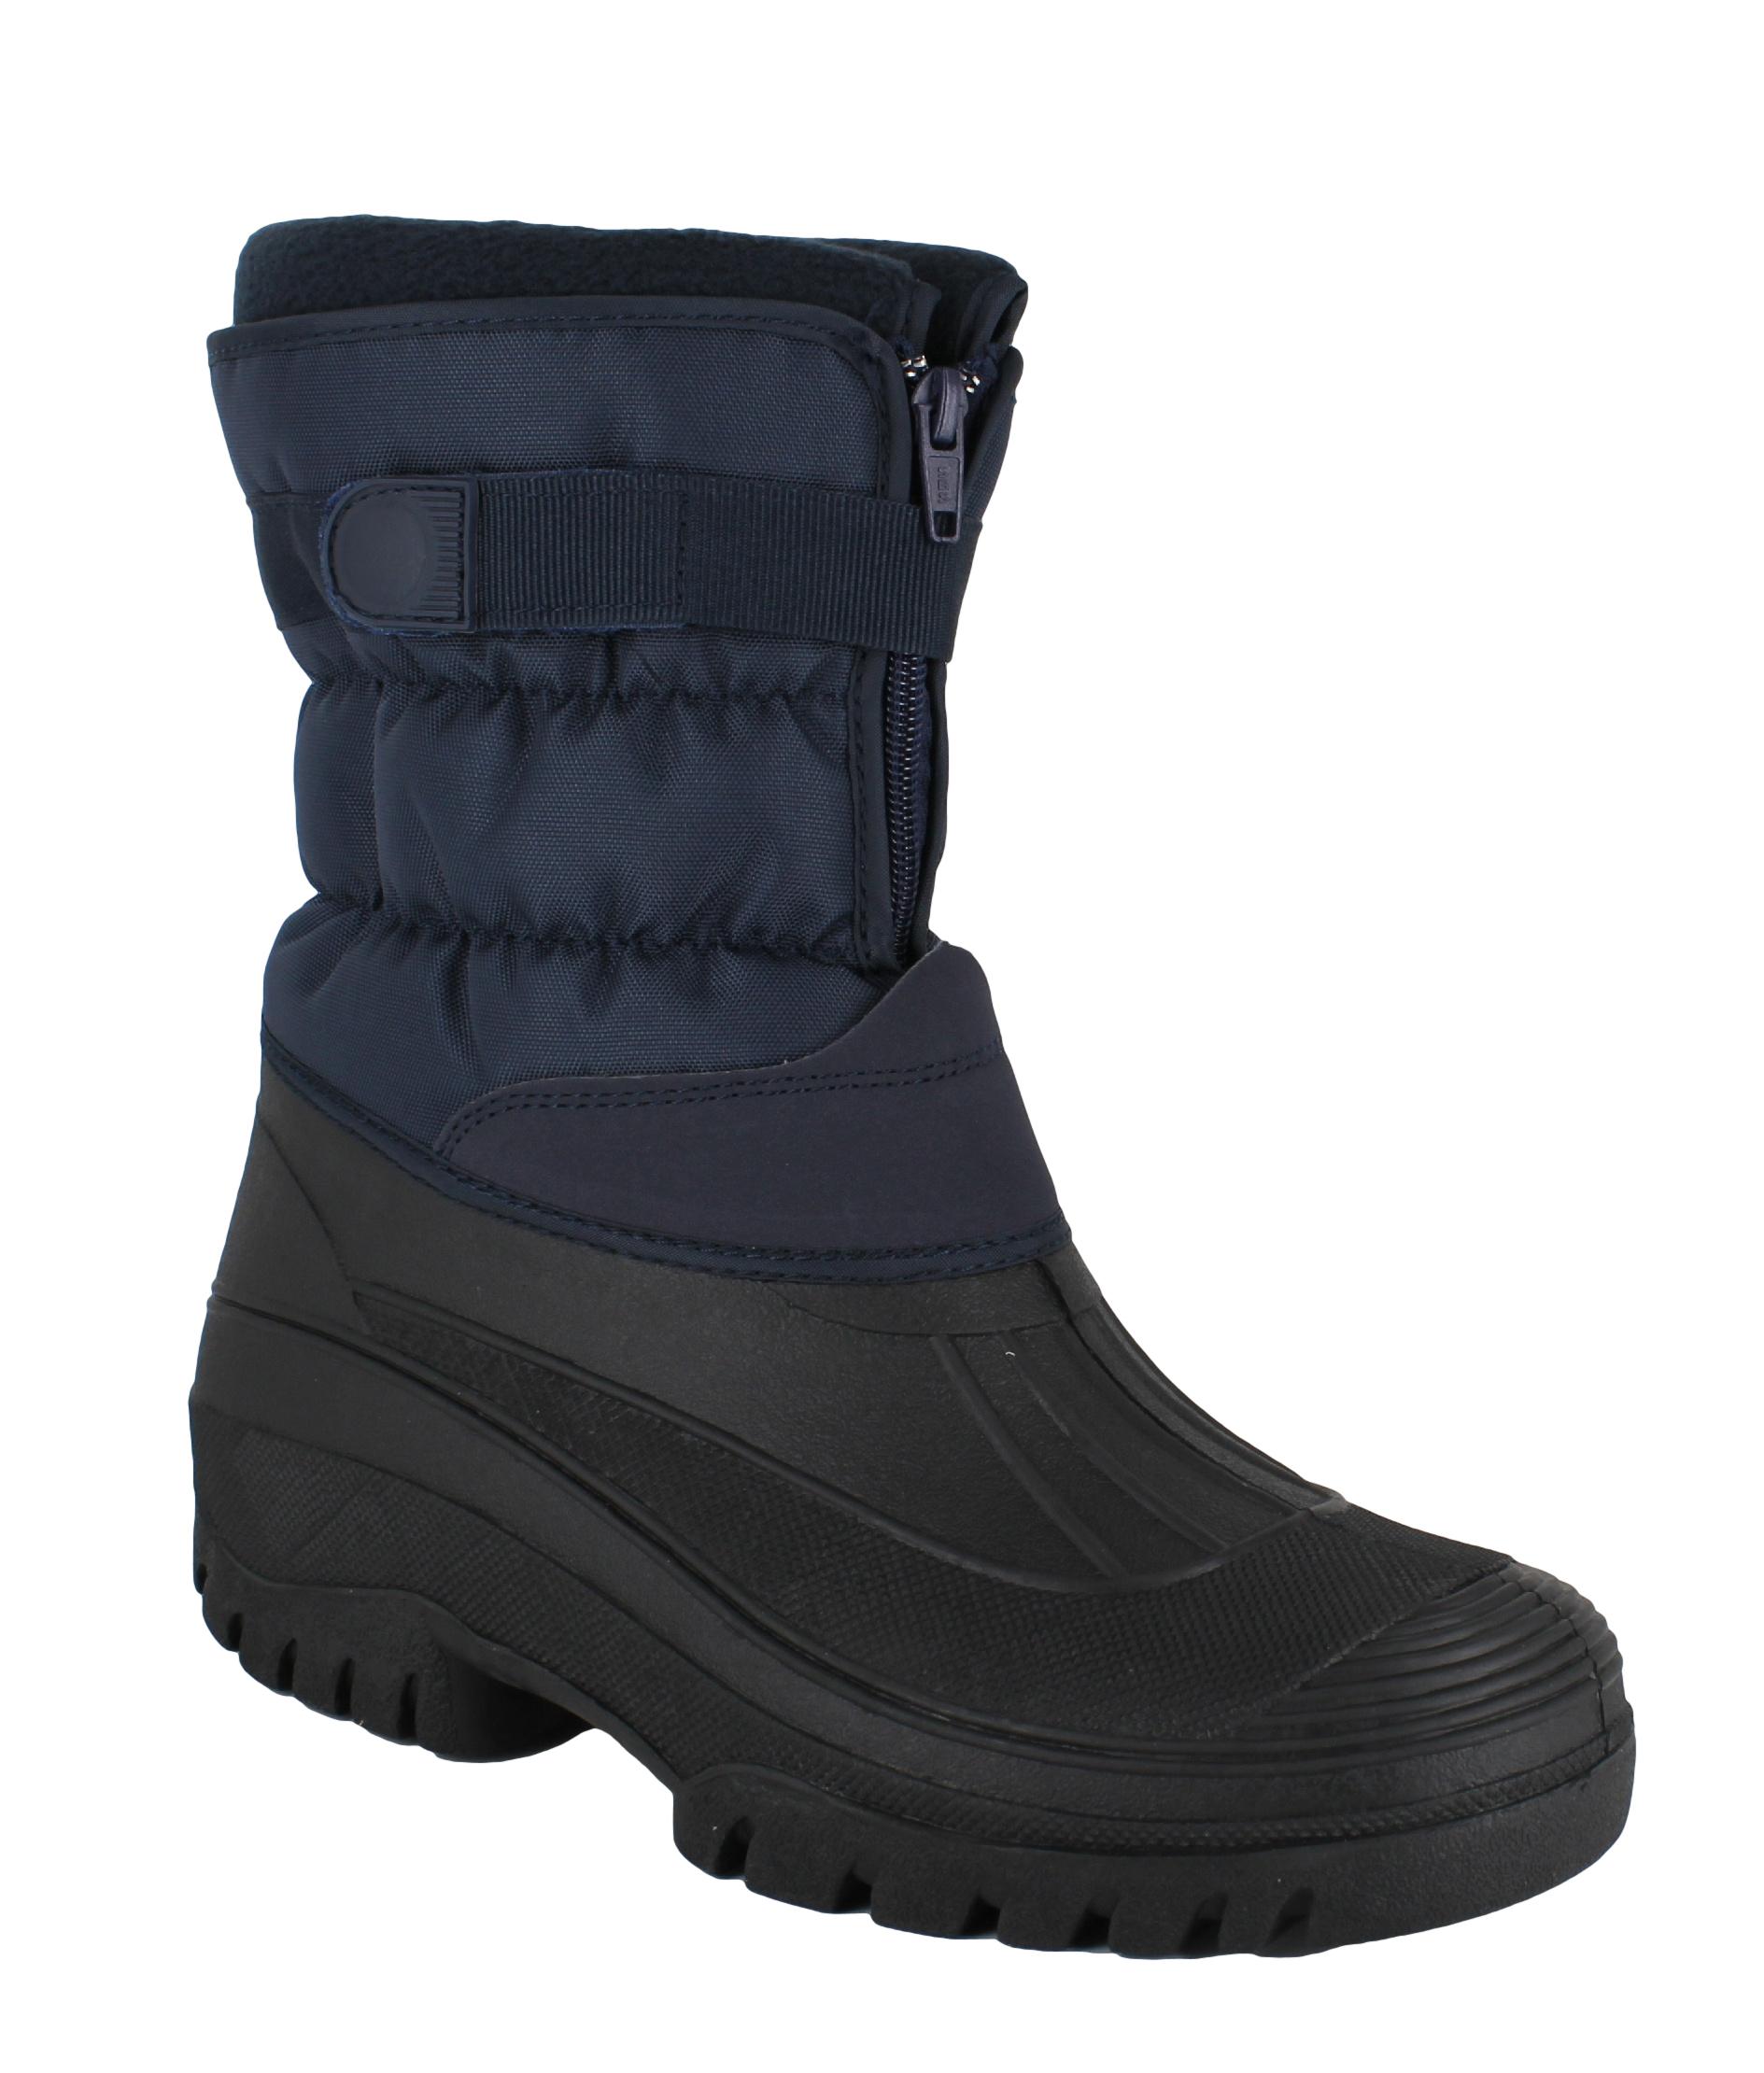 mens groundwork muckers mukker stable winter snow boots uk